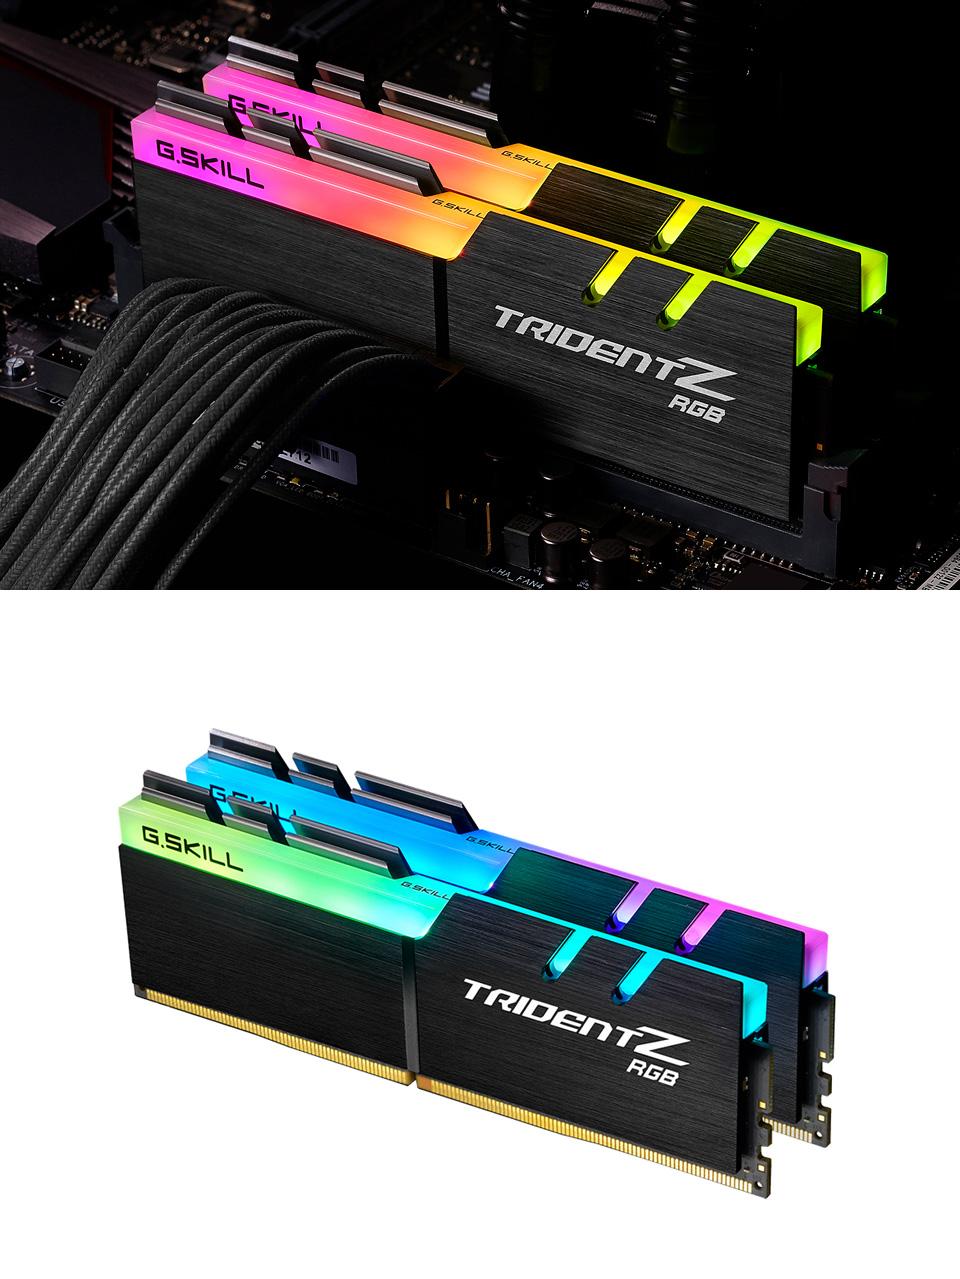 G.Skill Trident Z RGB F4-3600C18D-16GTZR 16GB (2x8GB) DDR4 product